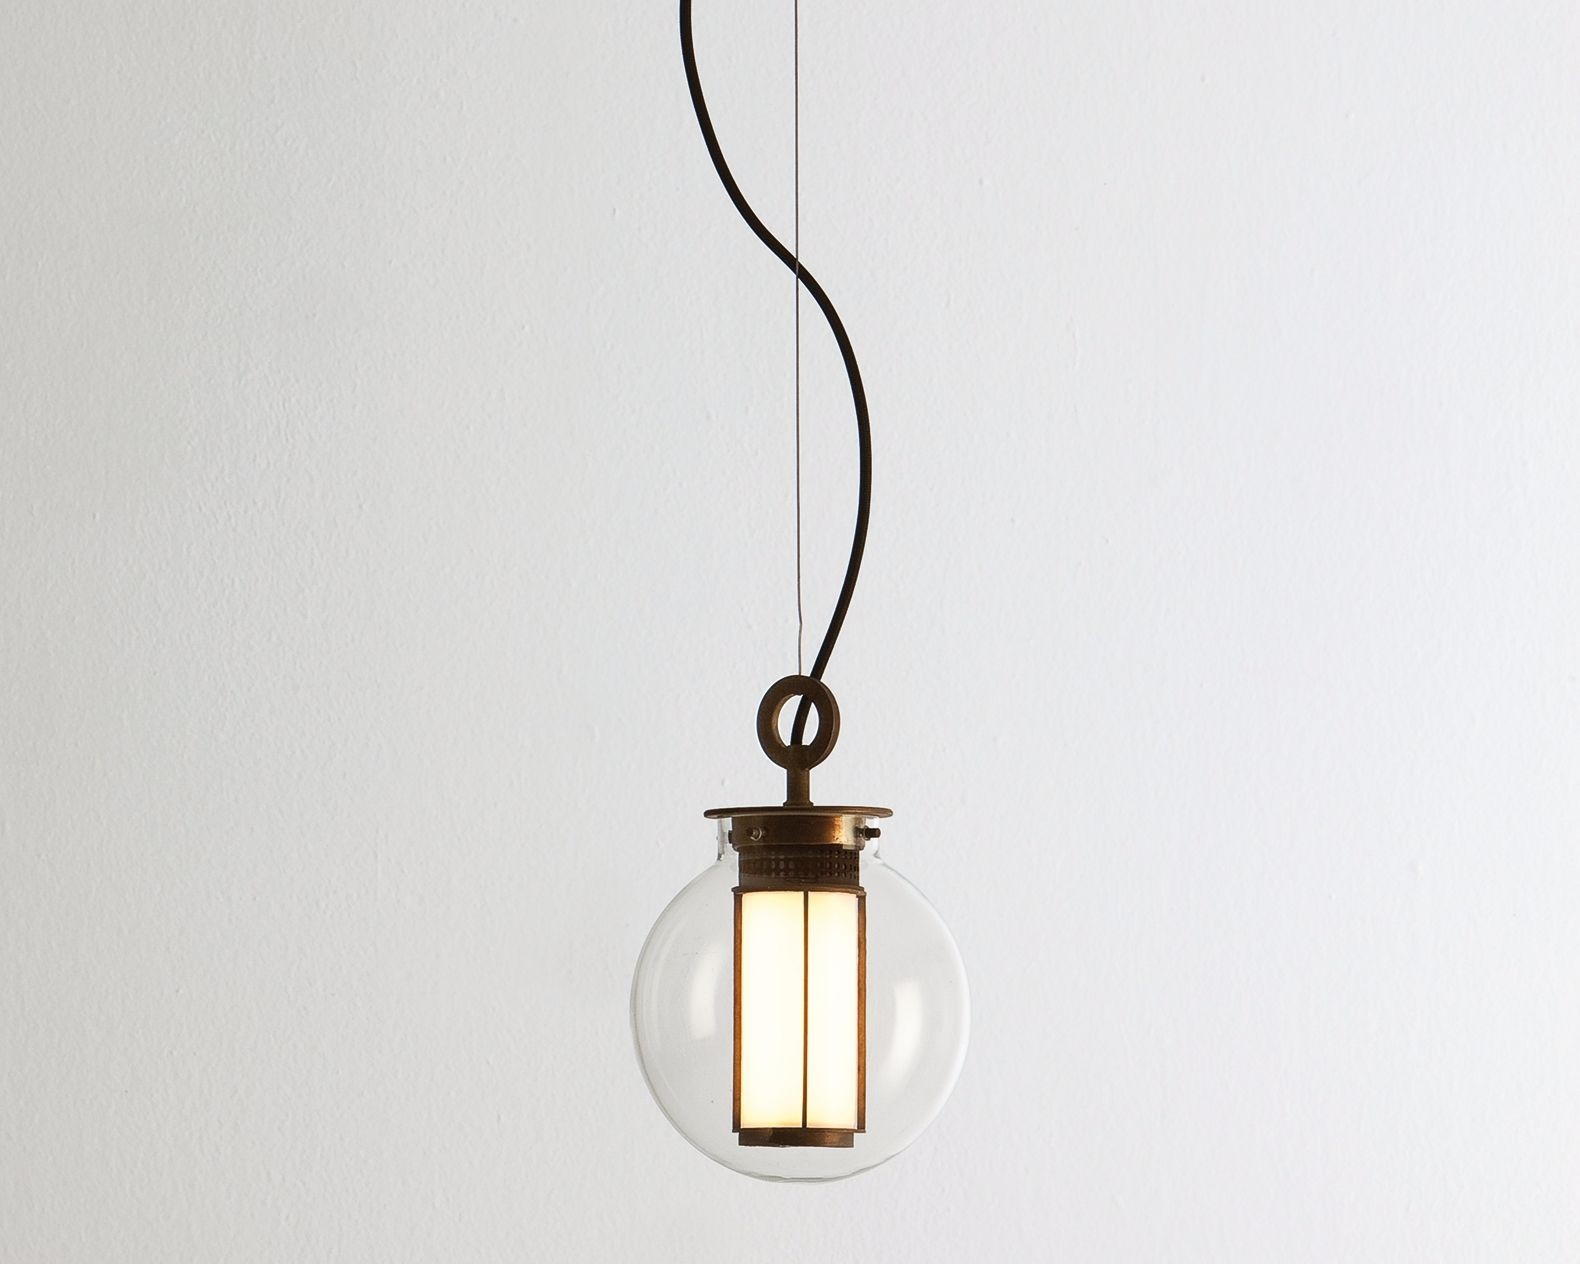 Bai Di Di Suspension Lamp